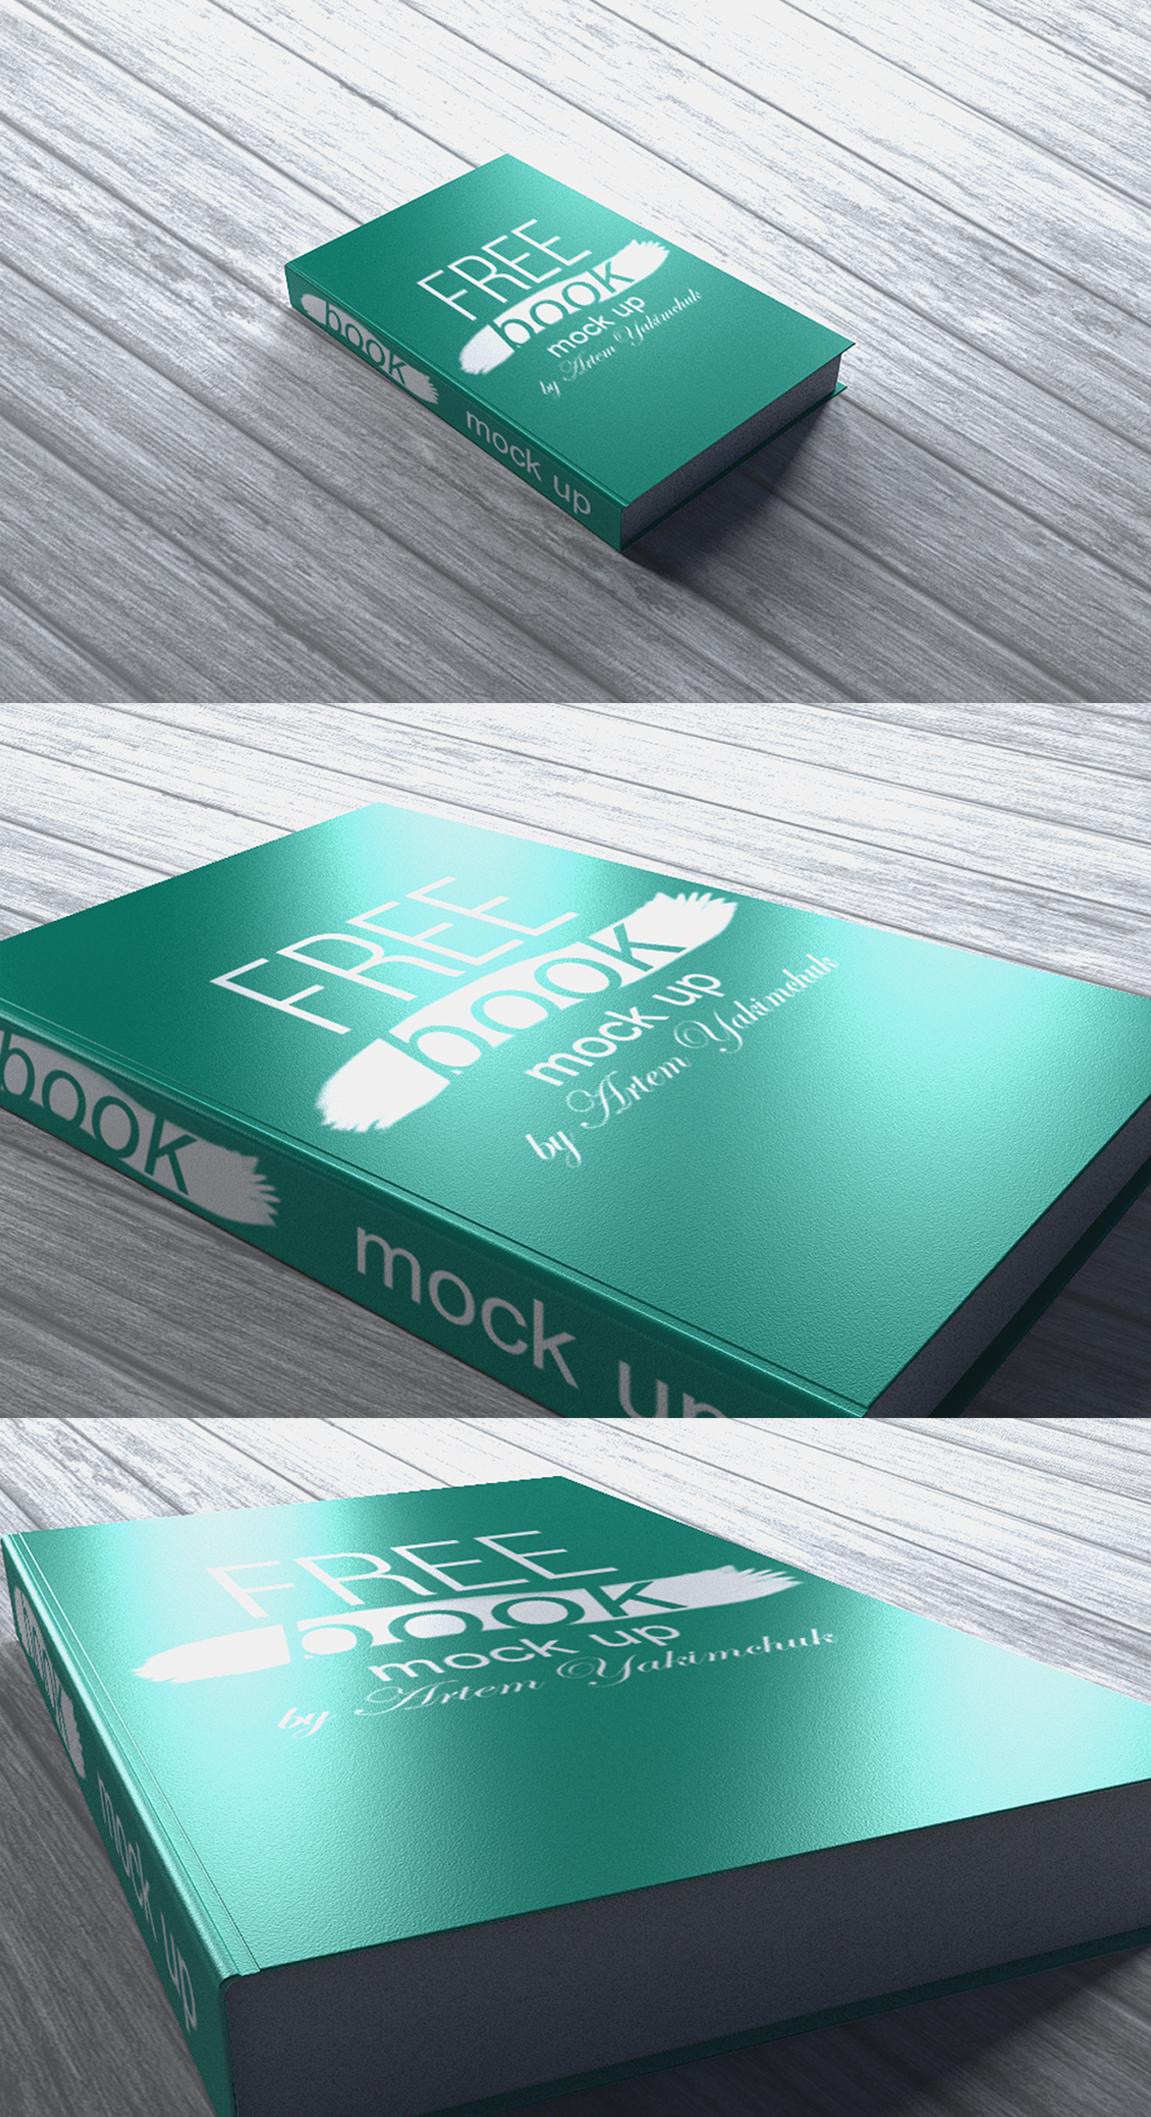 17 Free Book MockUp